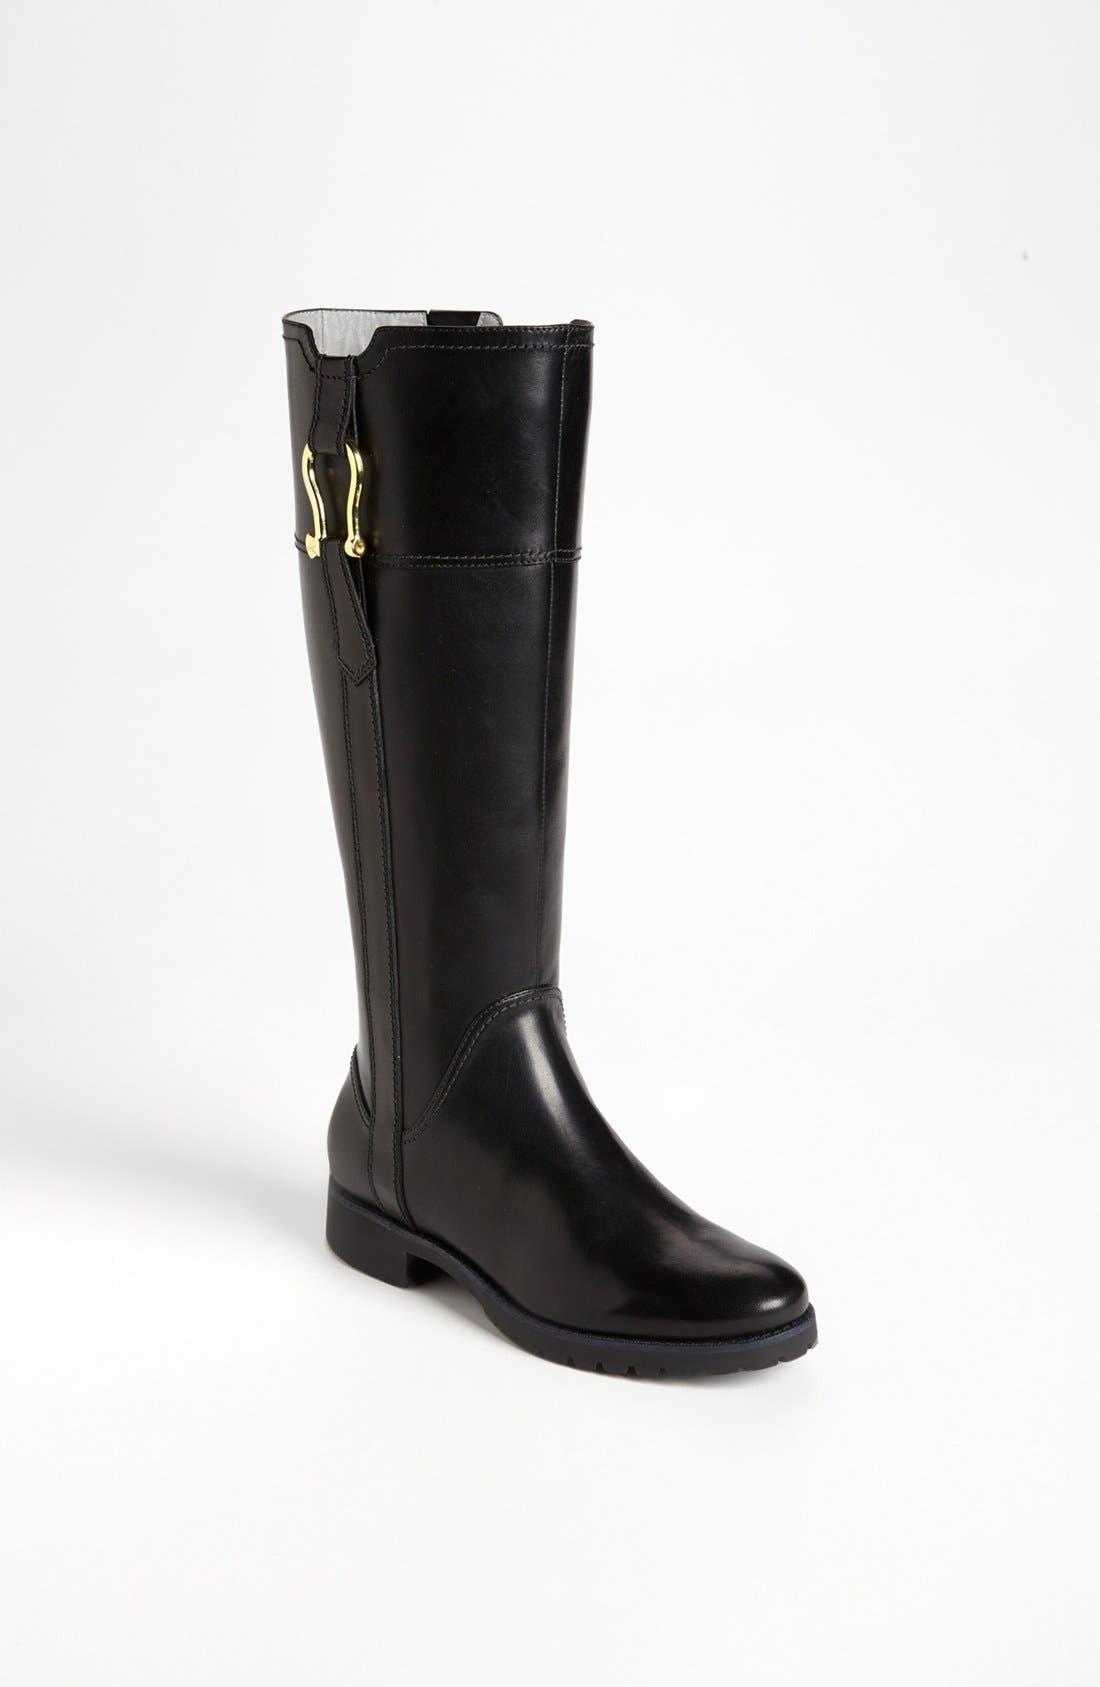 Alternate Image 1 Selected - Sperry Top-Sider® 'Suffolk' Waterproof Boot